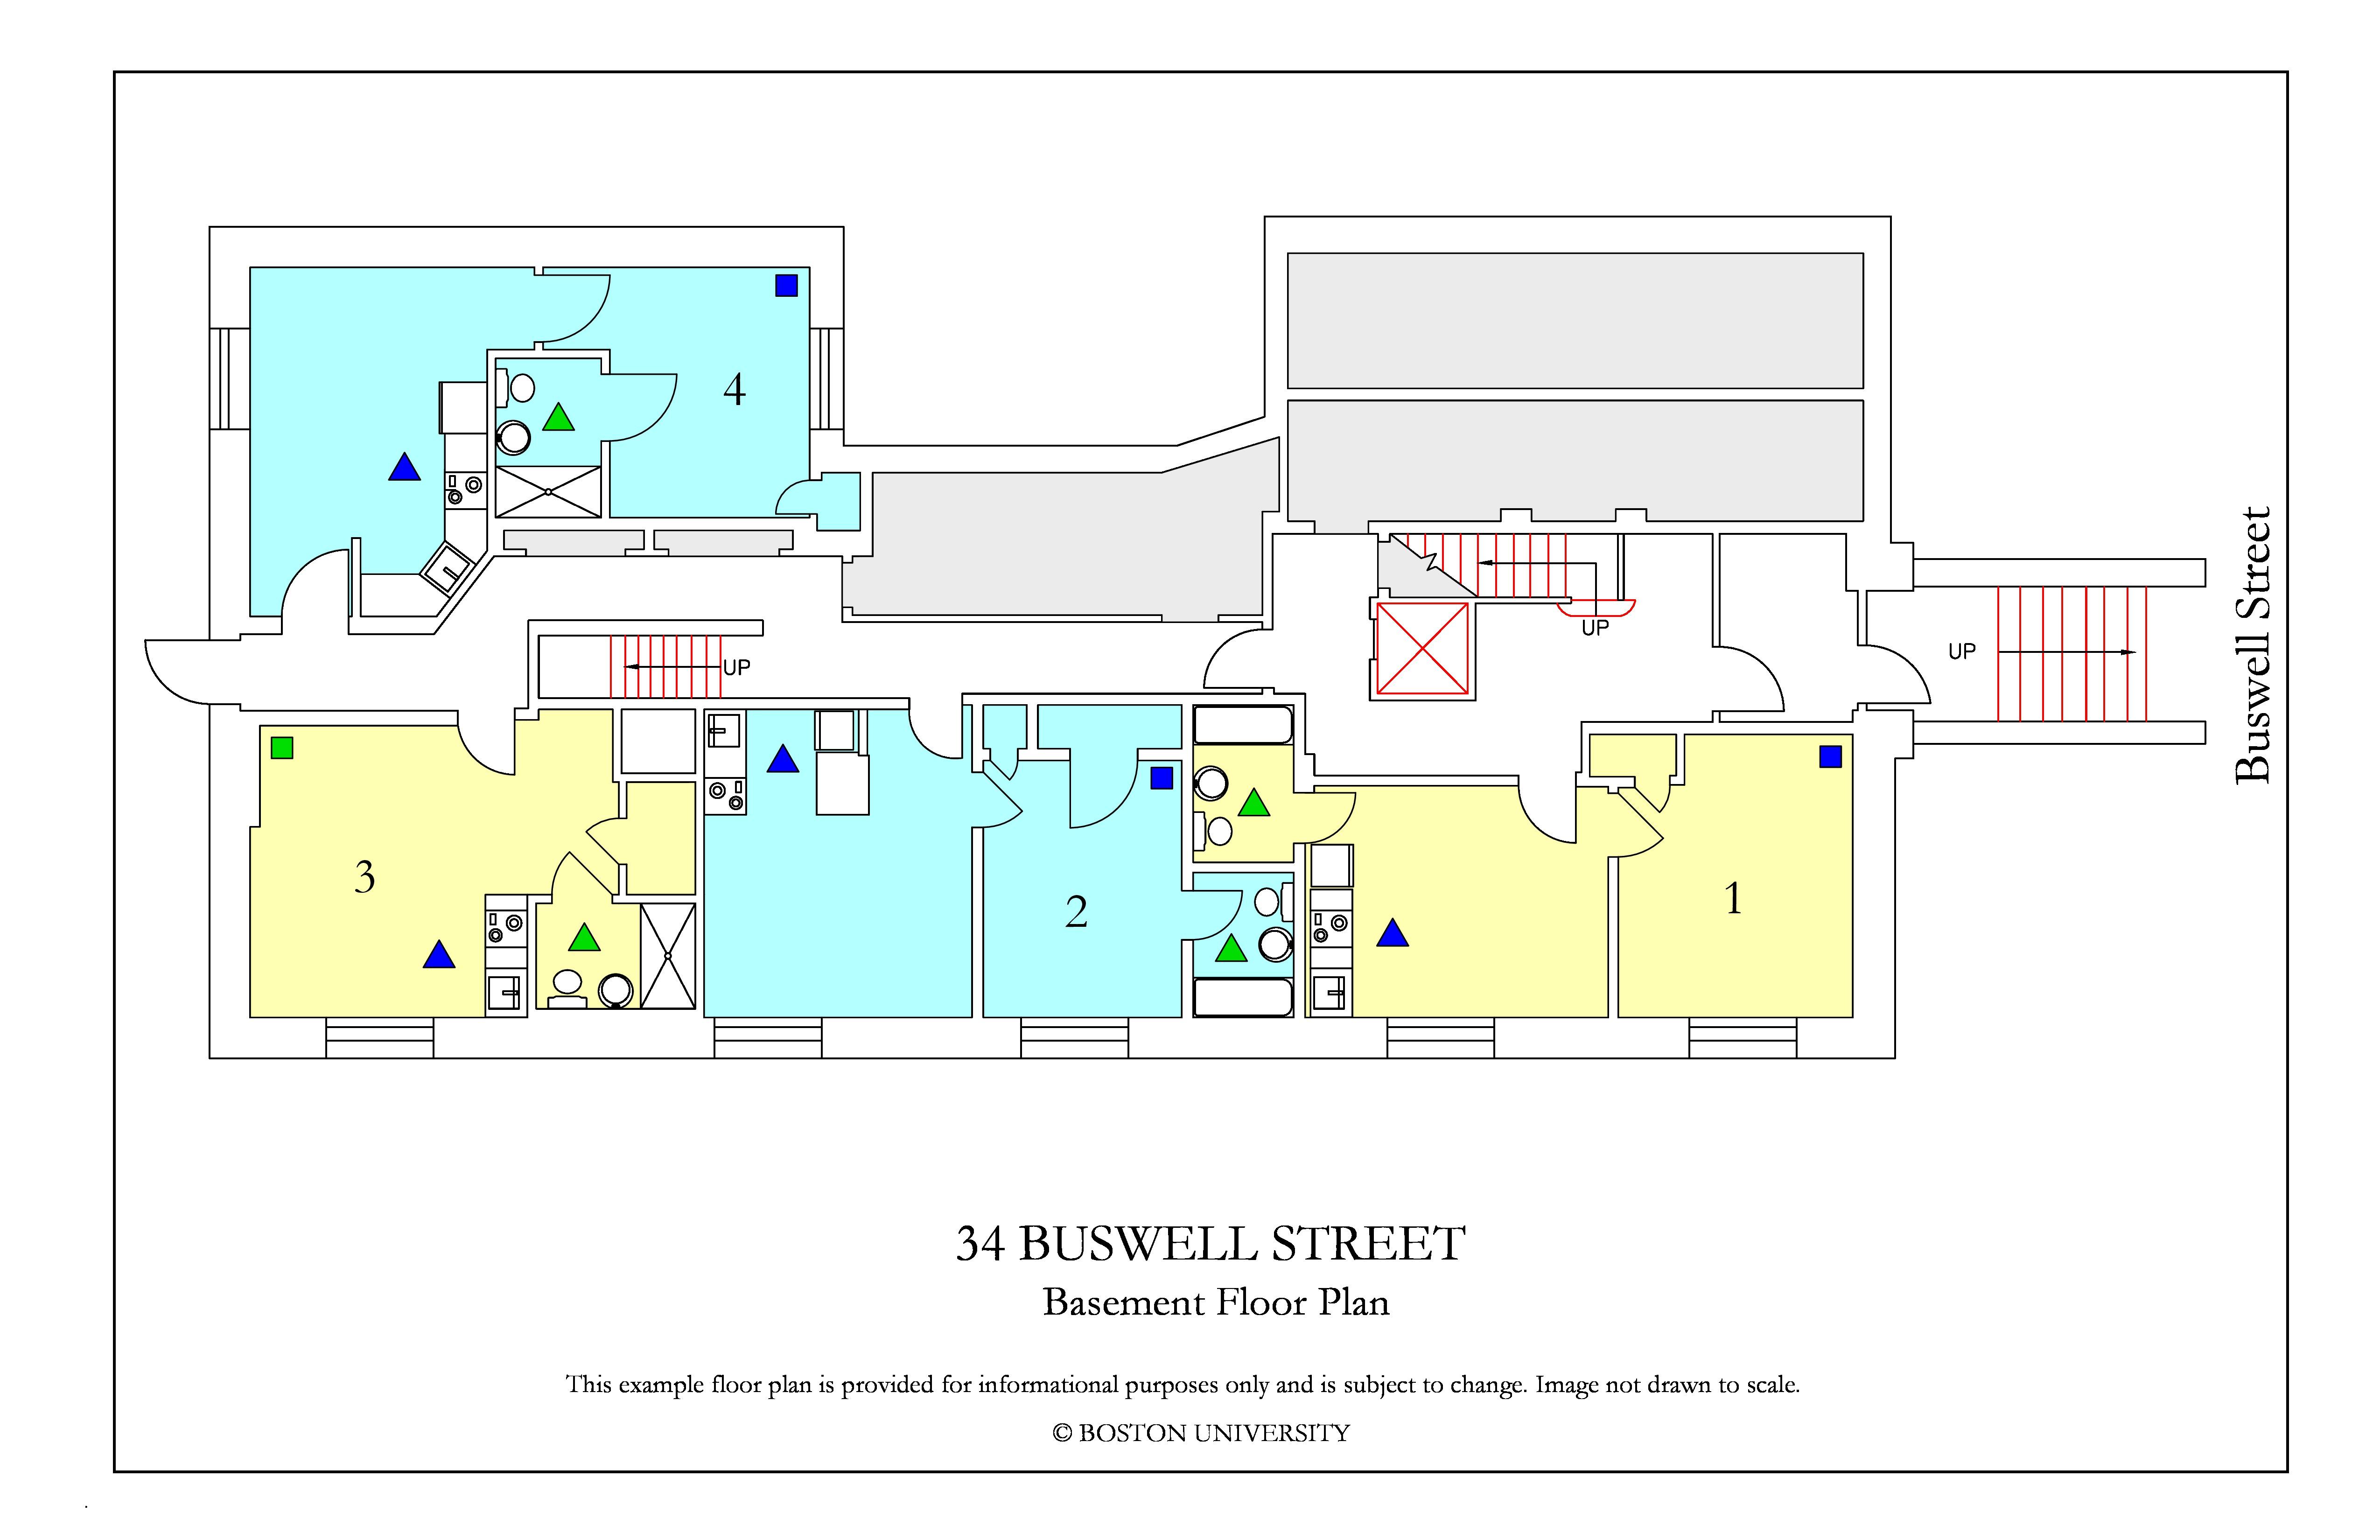 34 Buswell Street Housing